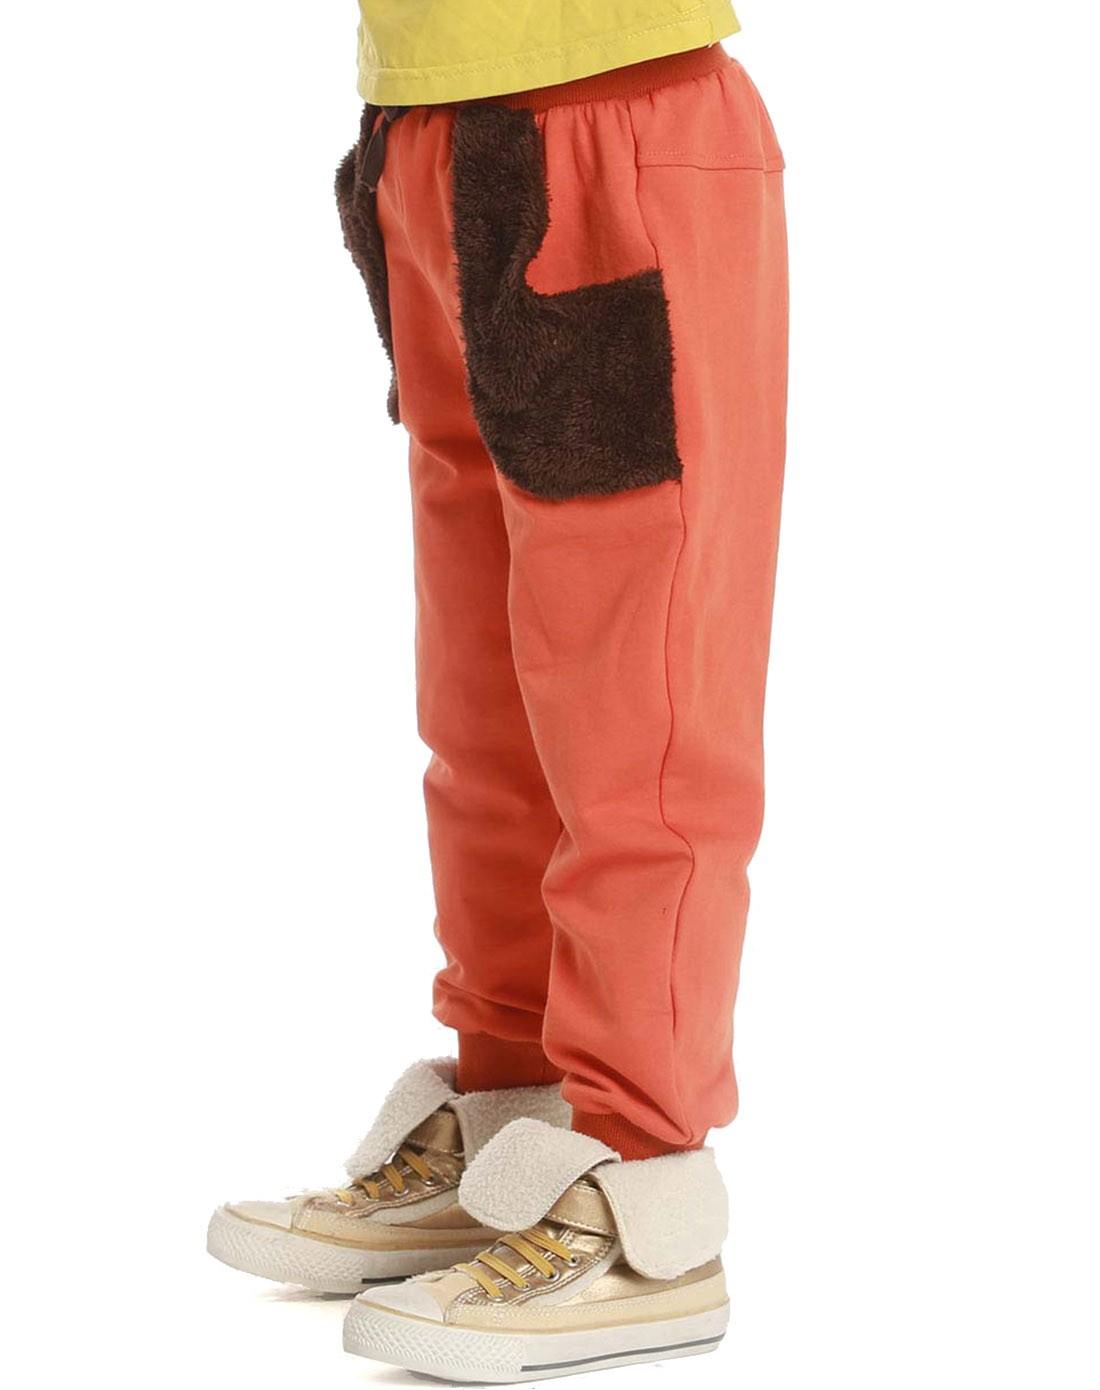 latin男女童女童桔色裤子235798916